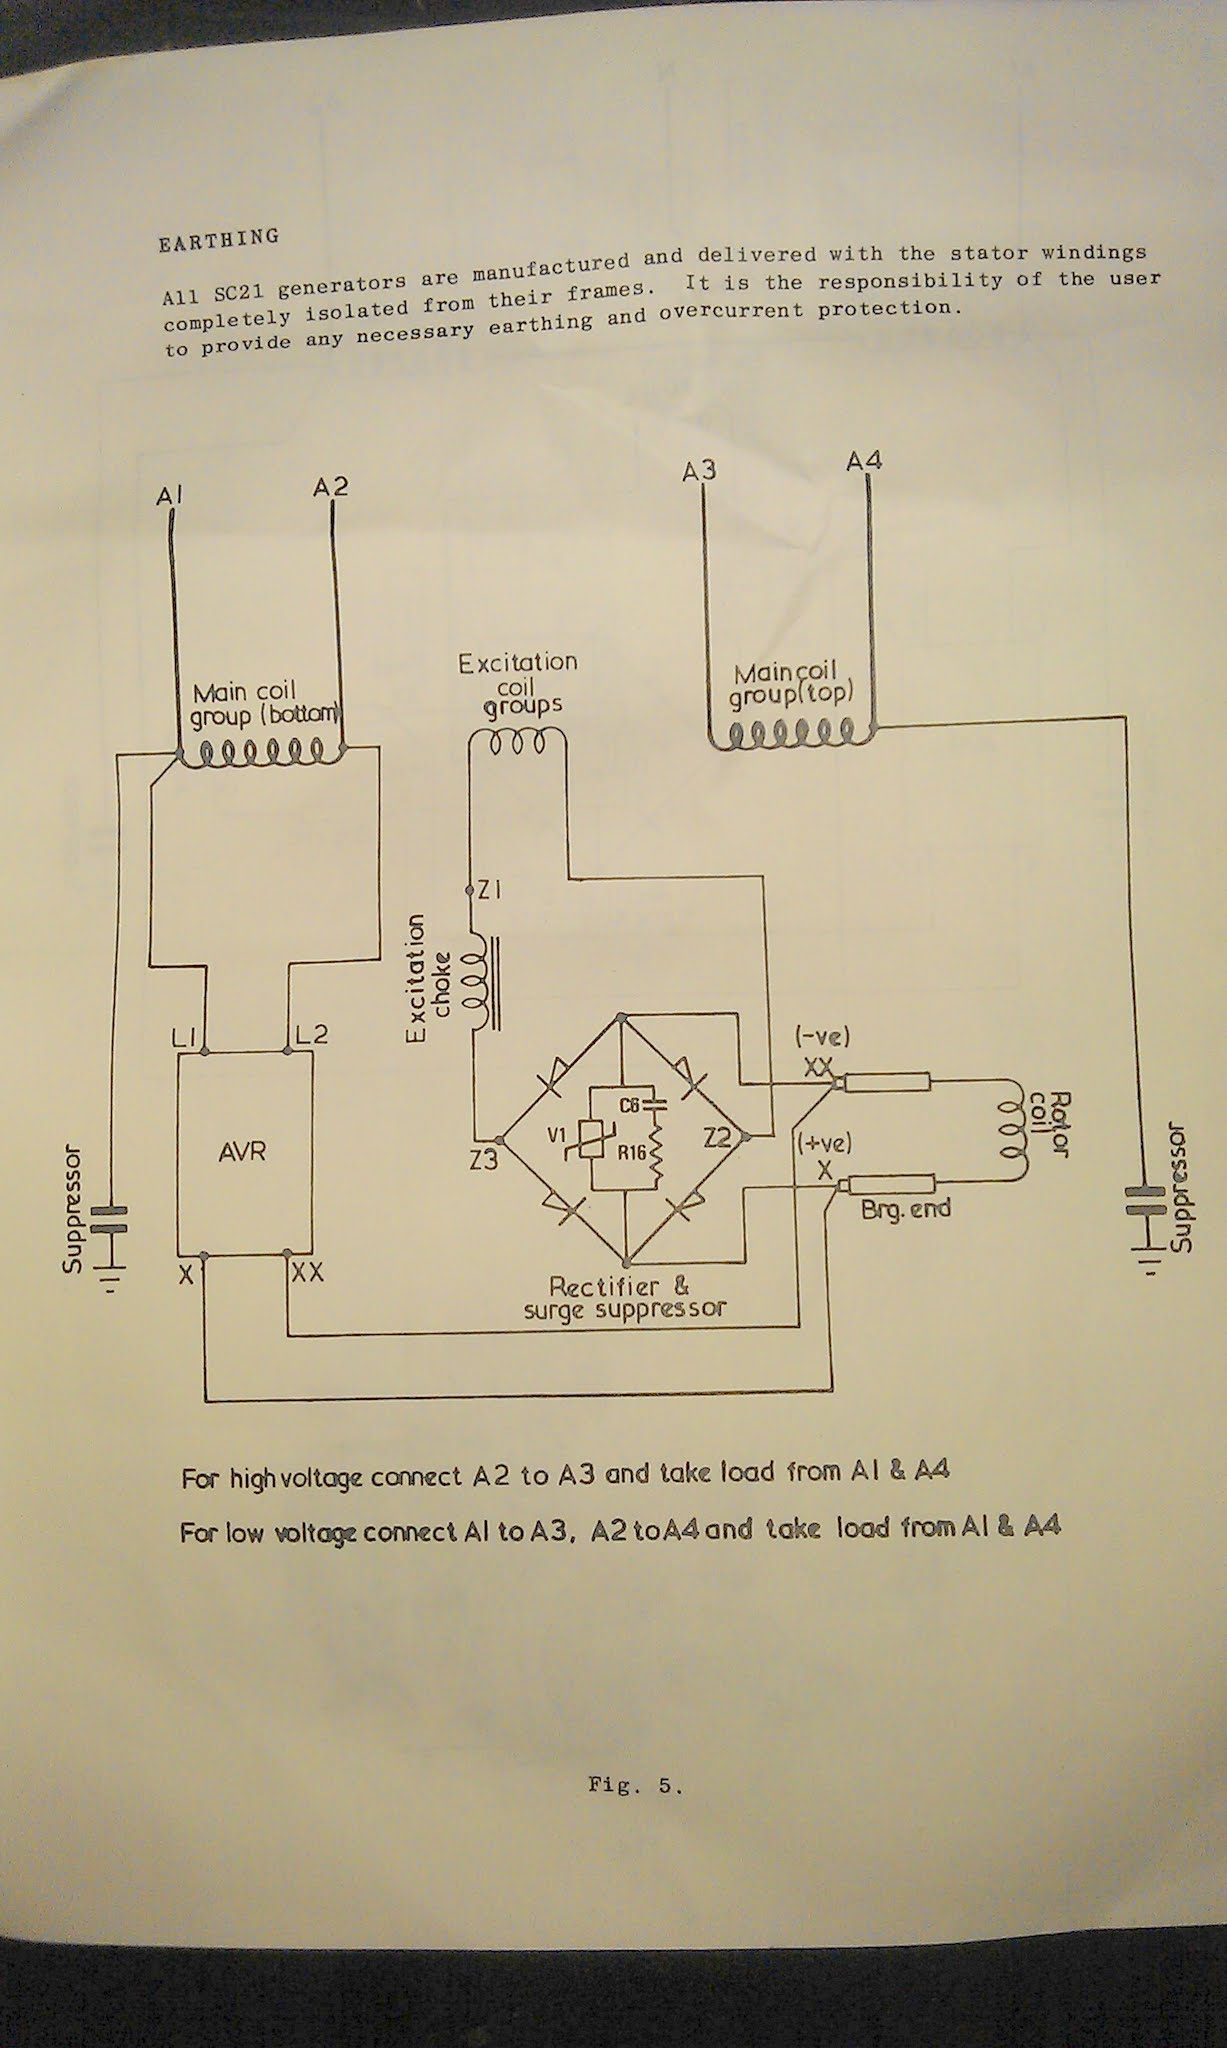 IMAG0443 markon sc21g field current control smokstak sx460 wiring diagram at readyjetset.co